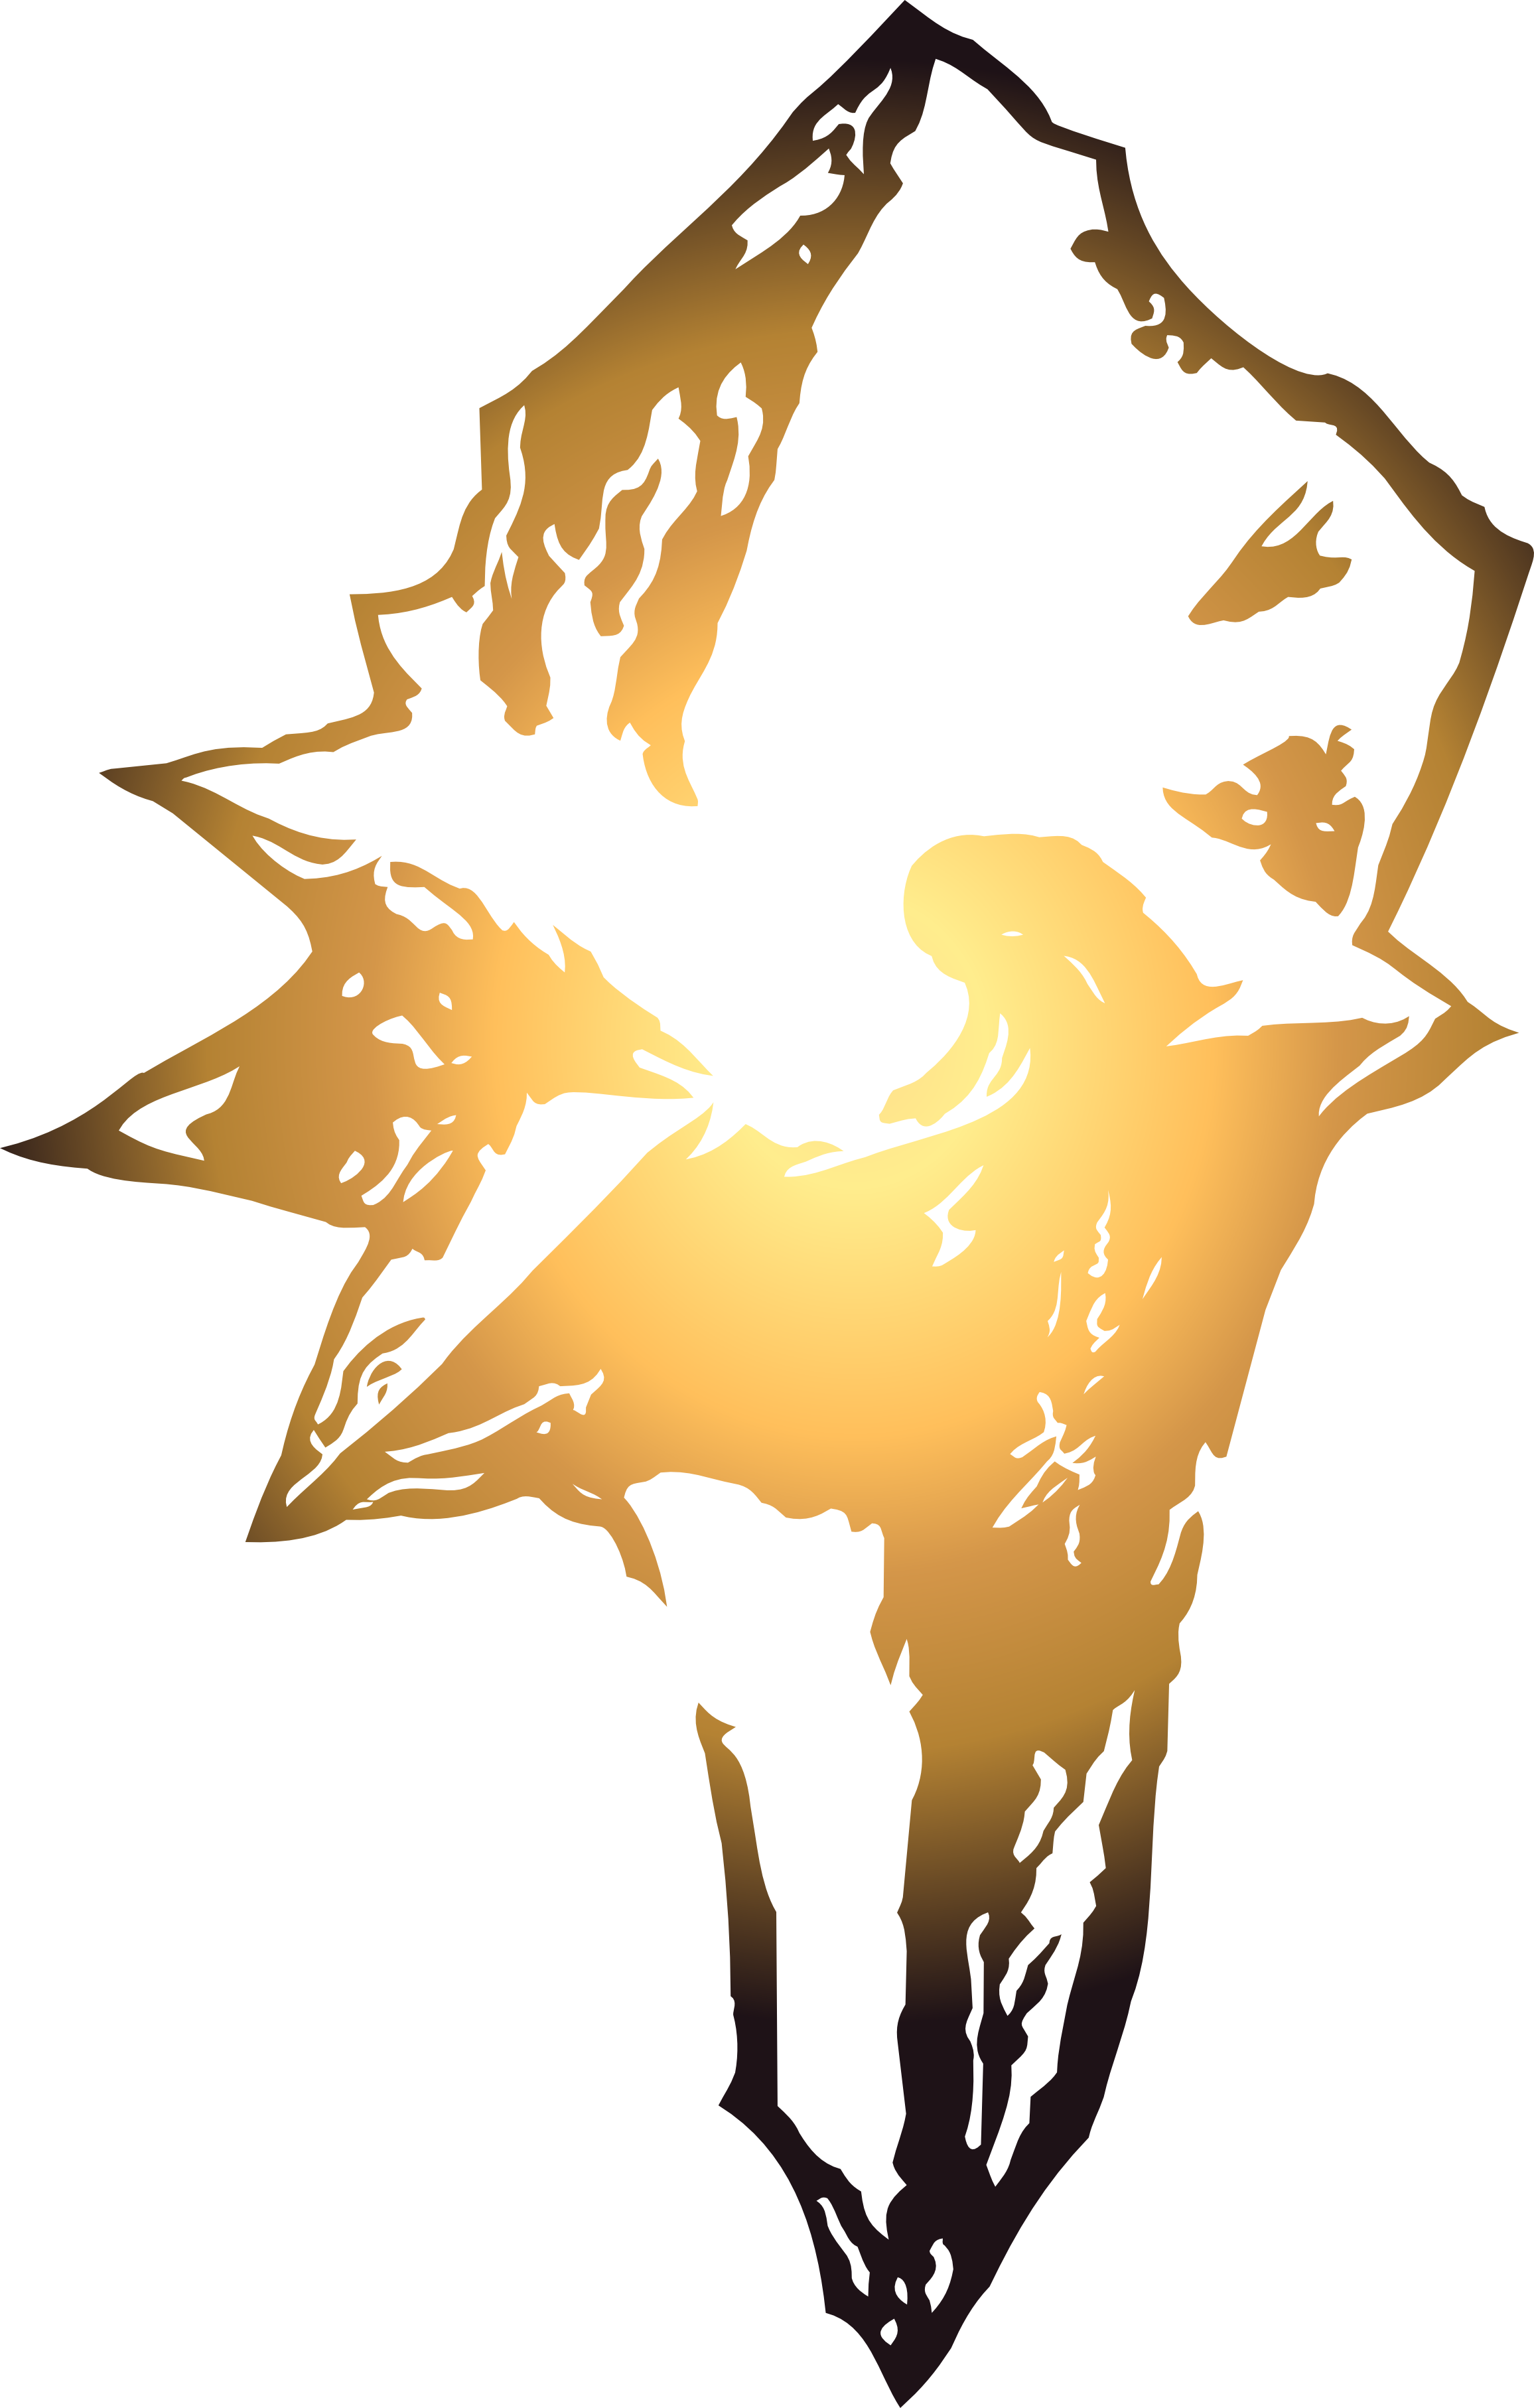 Final Fantasy Ix Logo By Eldi13 On Deviantart Final Fantasy Tattoo Final Fantasy Ix Final Fantasy Logo